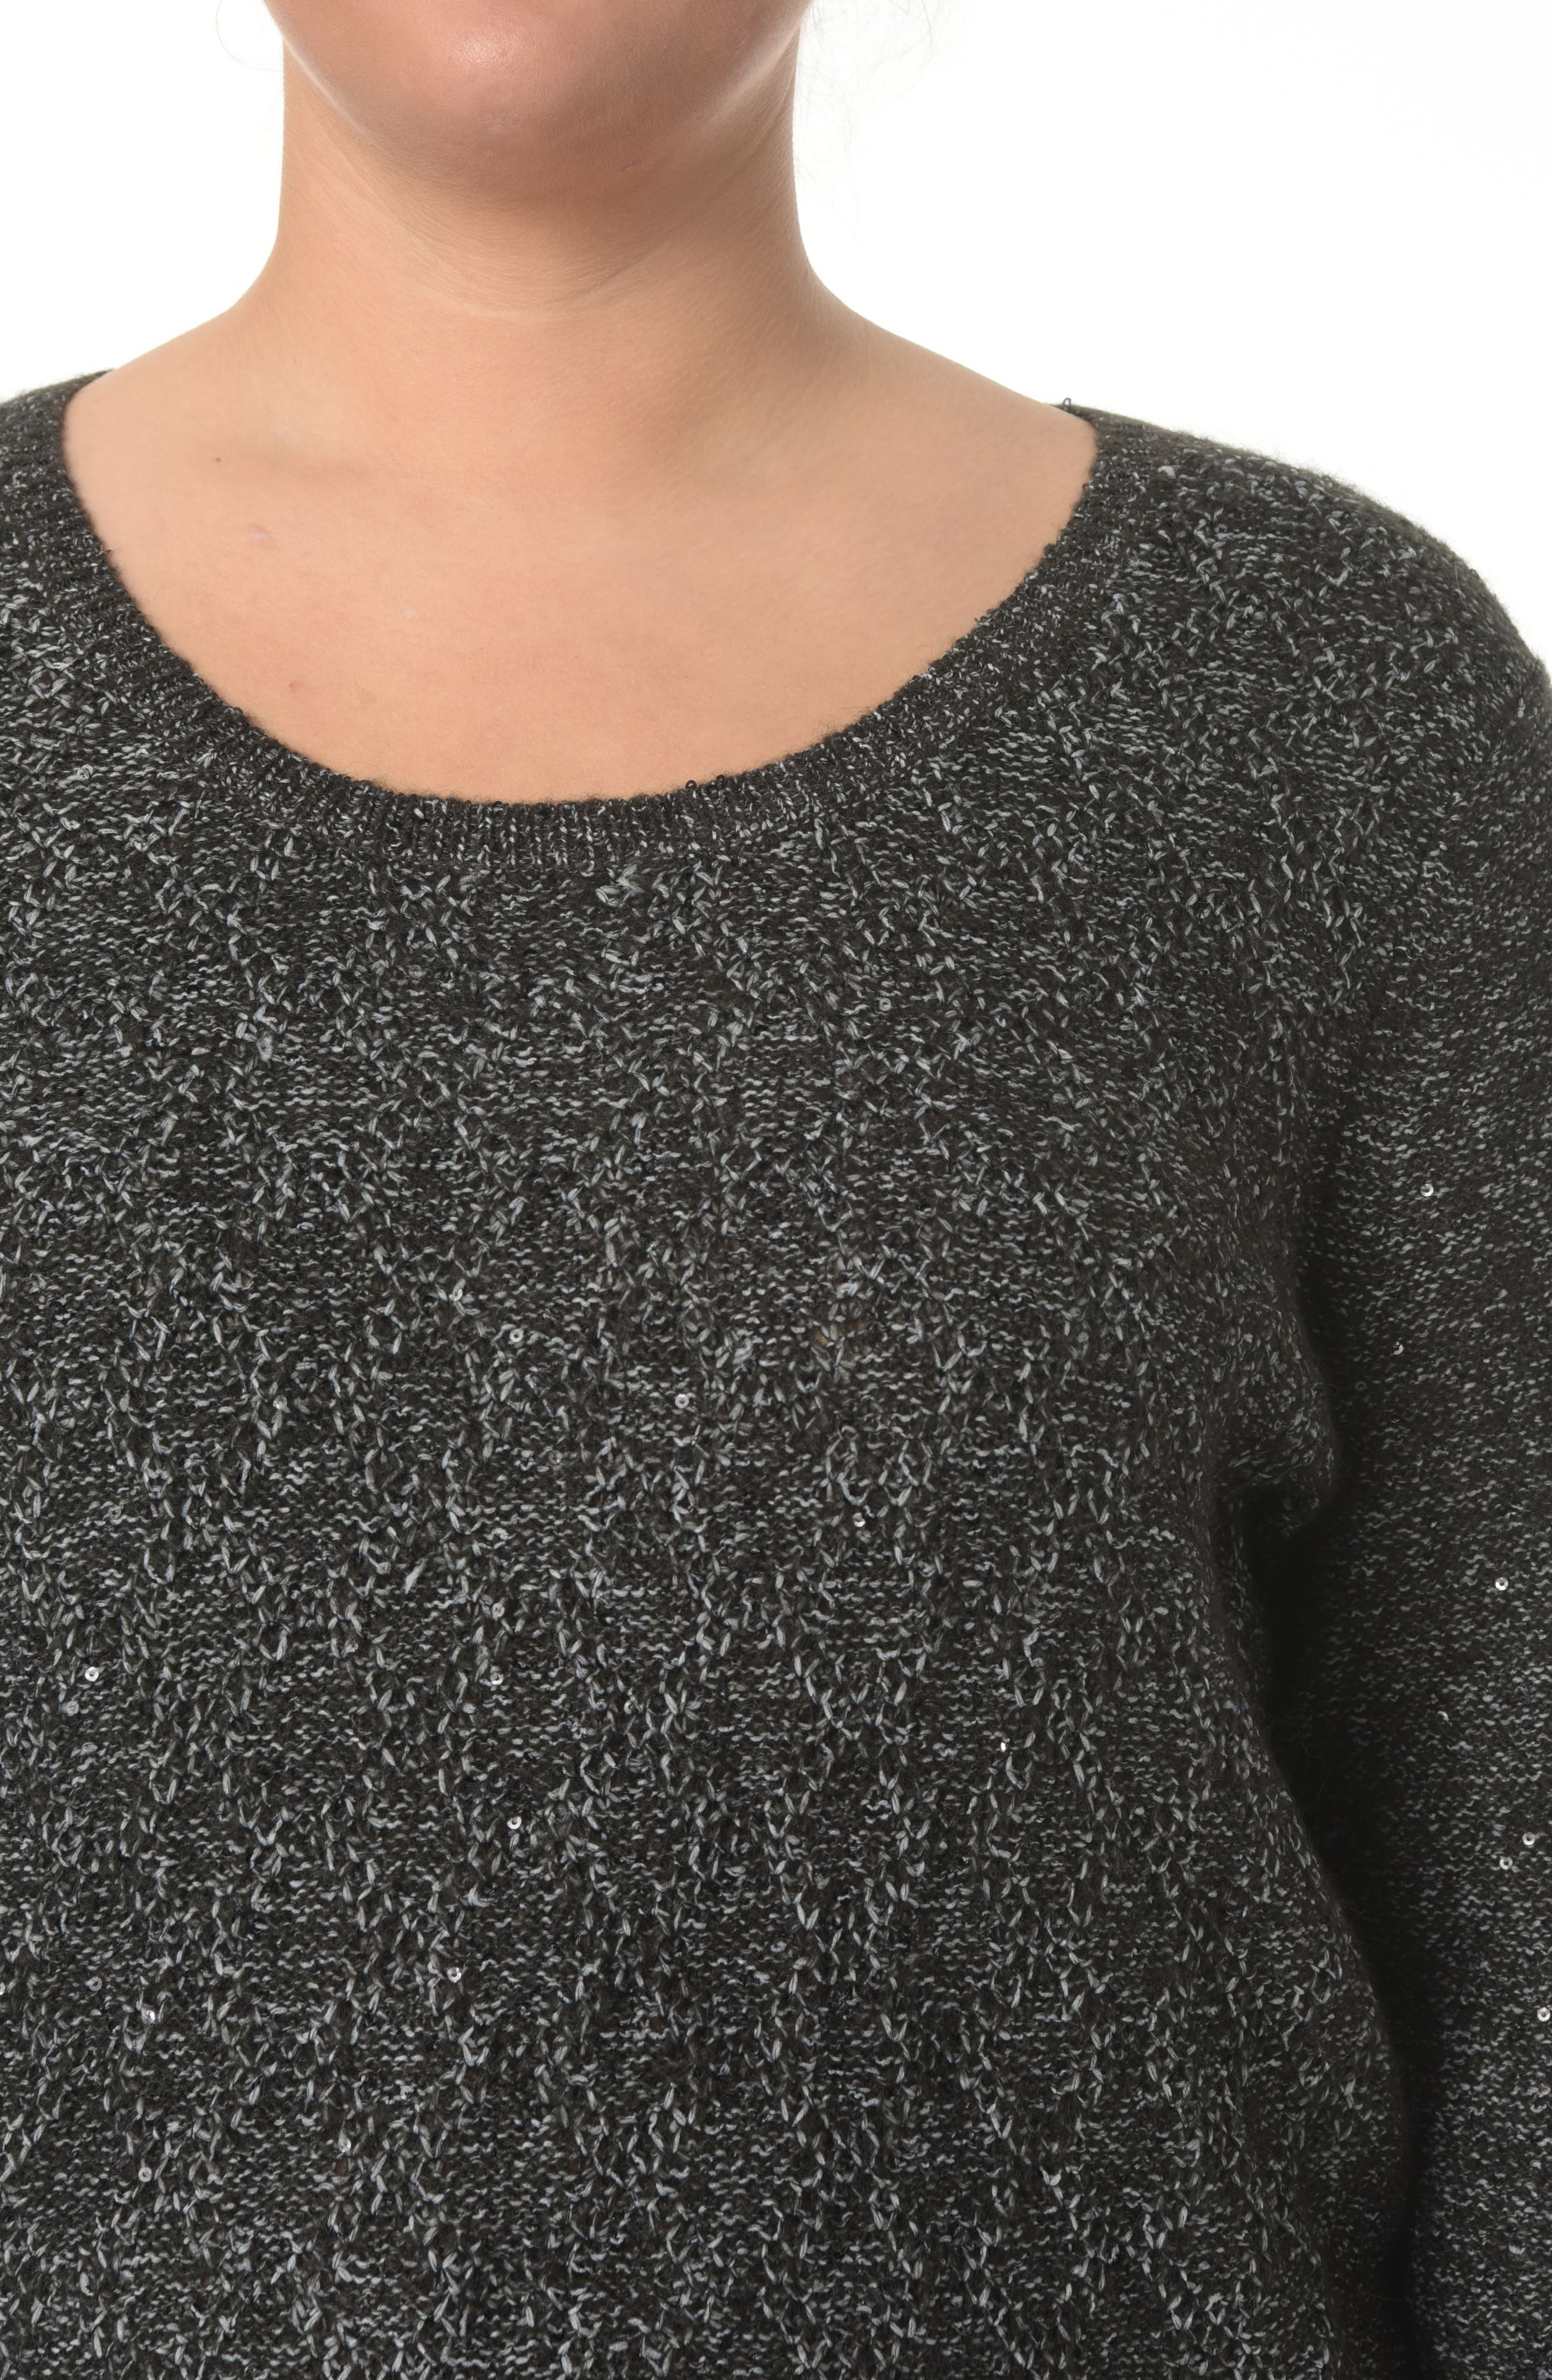 Sequin Scoop Neck Sweater,                             Alternate thumbnail 3, color,                             BLACK